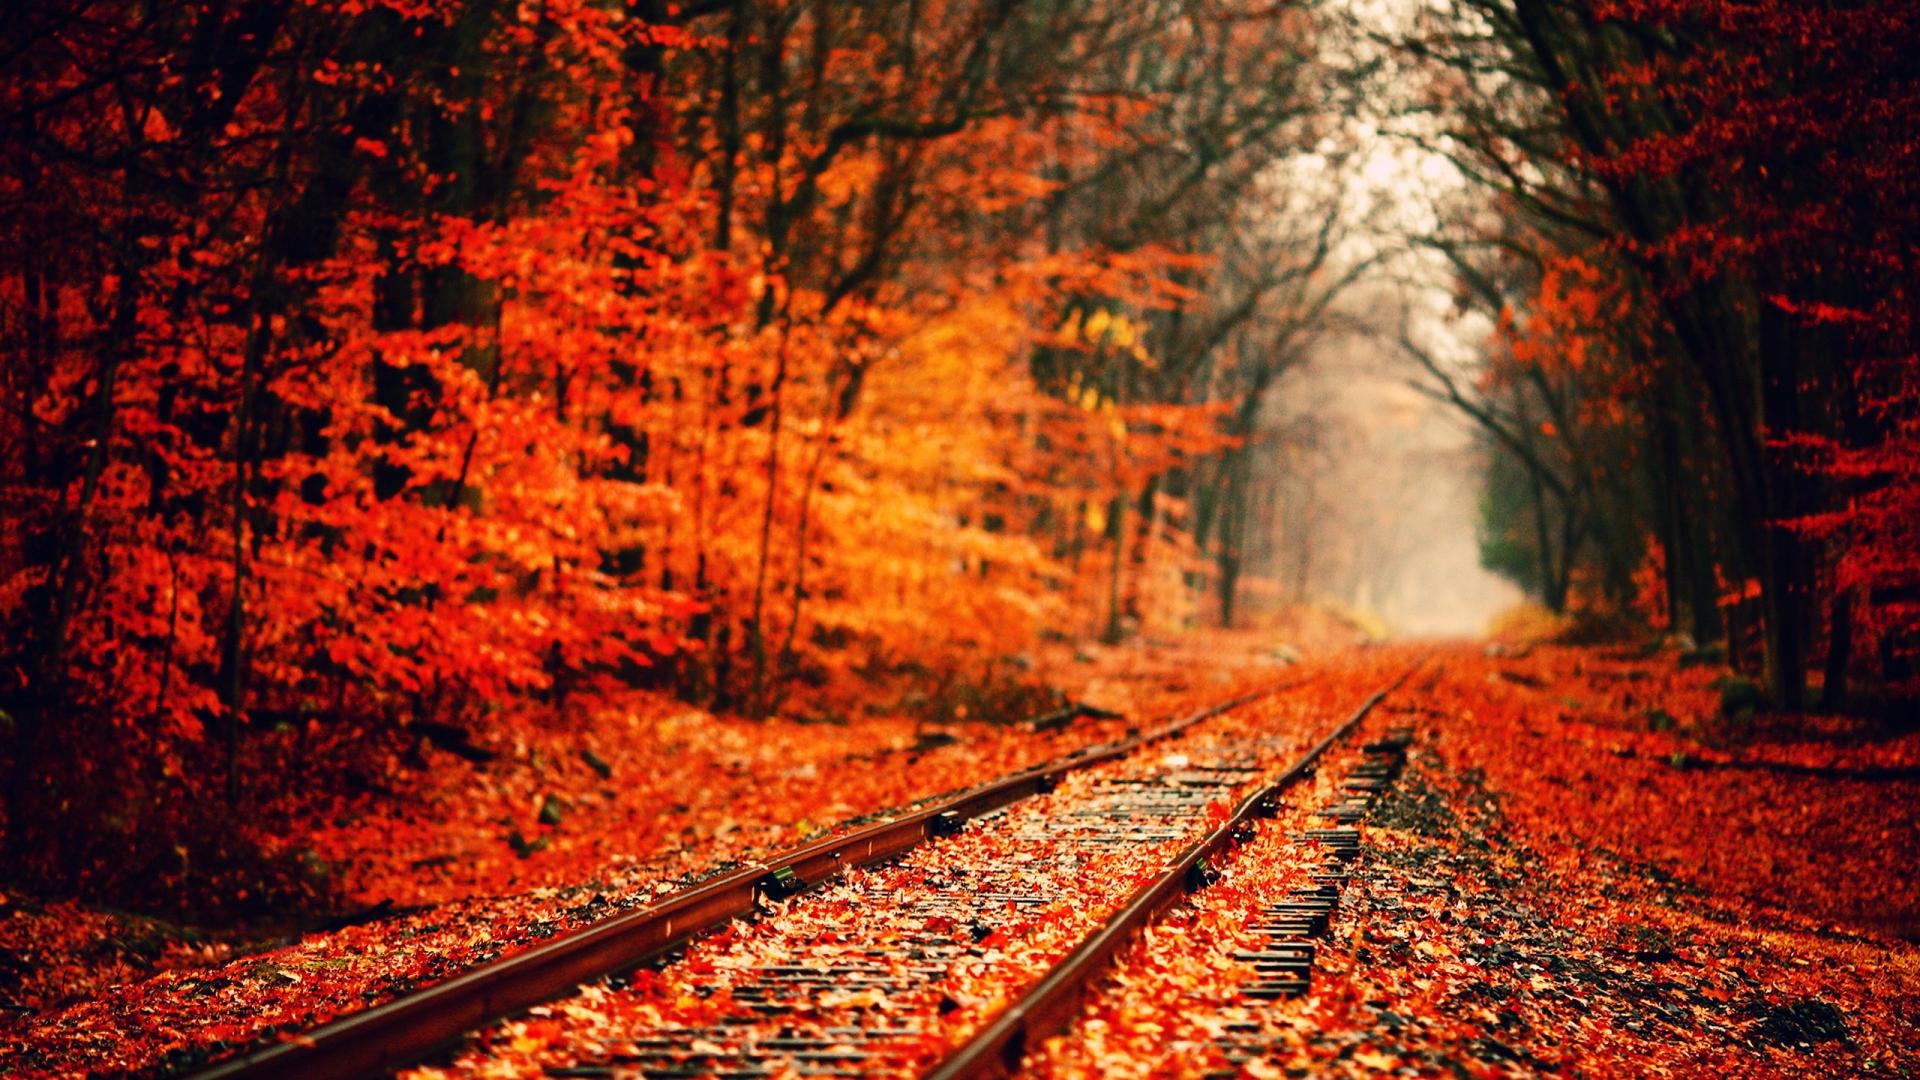 Fall Season Wallpaper Desktop Image 1920x1080